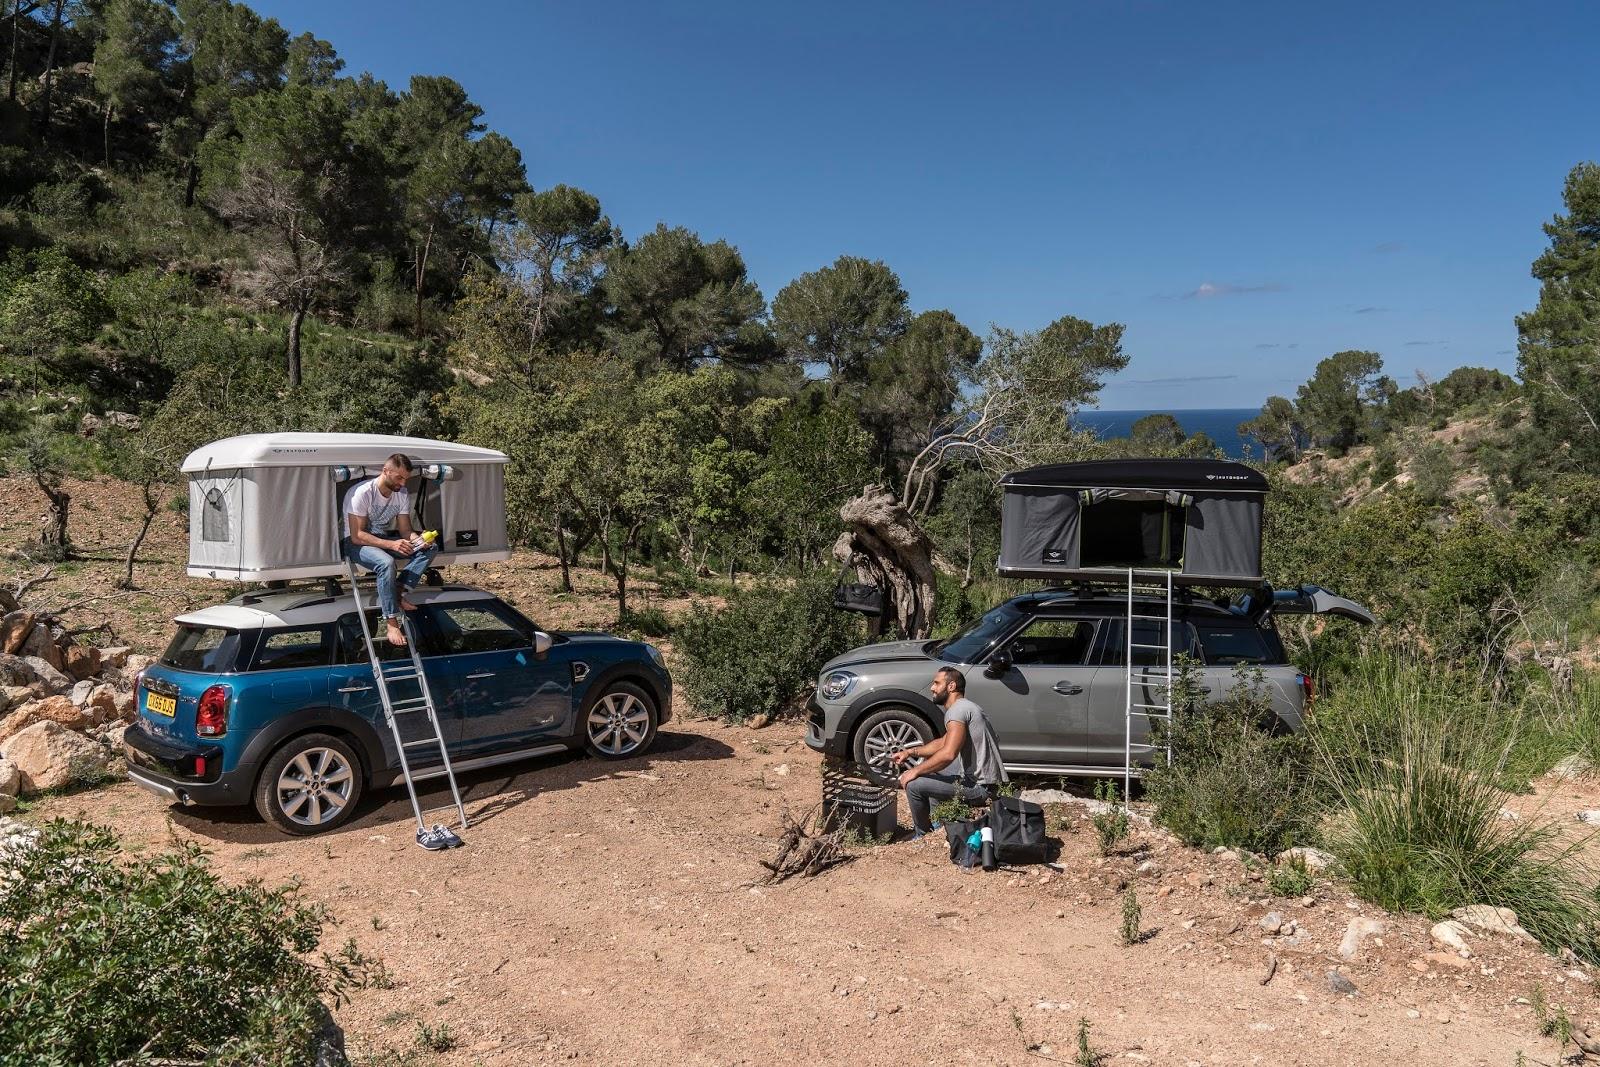 P90258010 highRes the autohome roof te Το MINI Countryman έχει και... σκηνή οροφής Mini, MINI Cooper Countryman, SUV